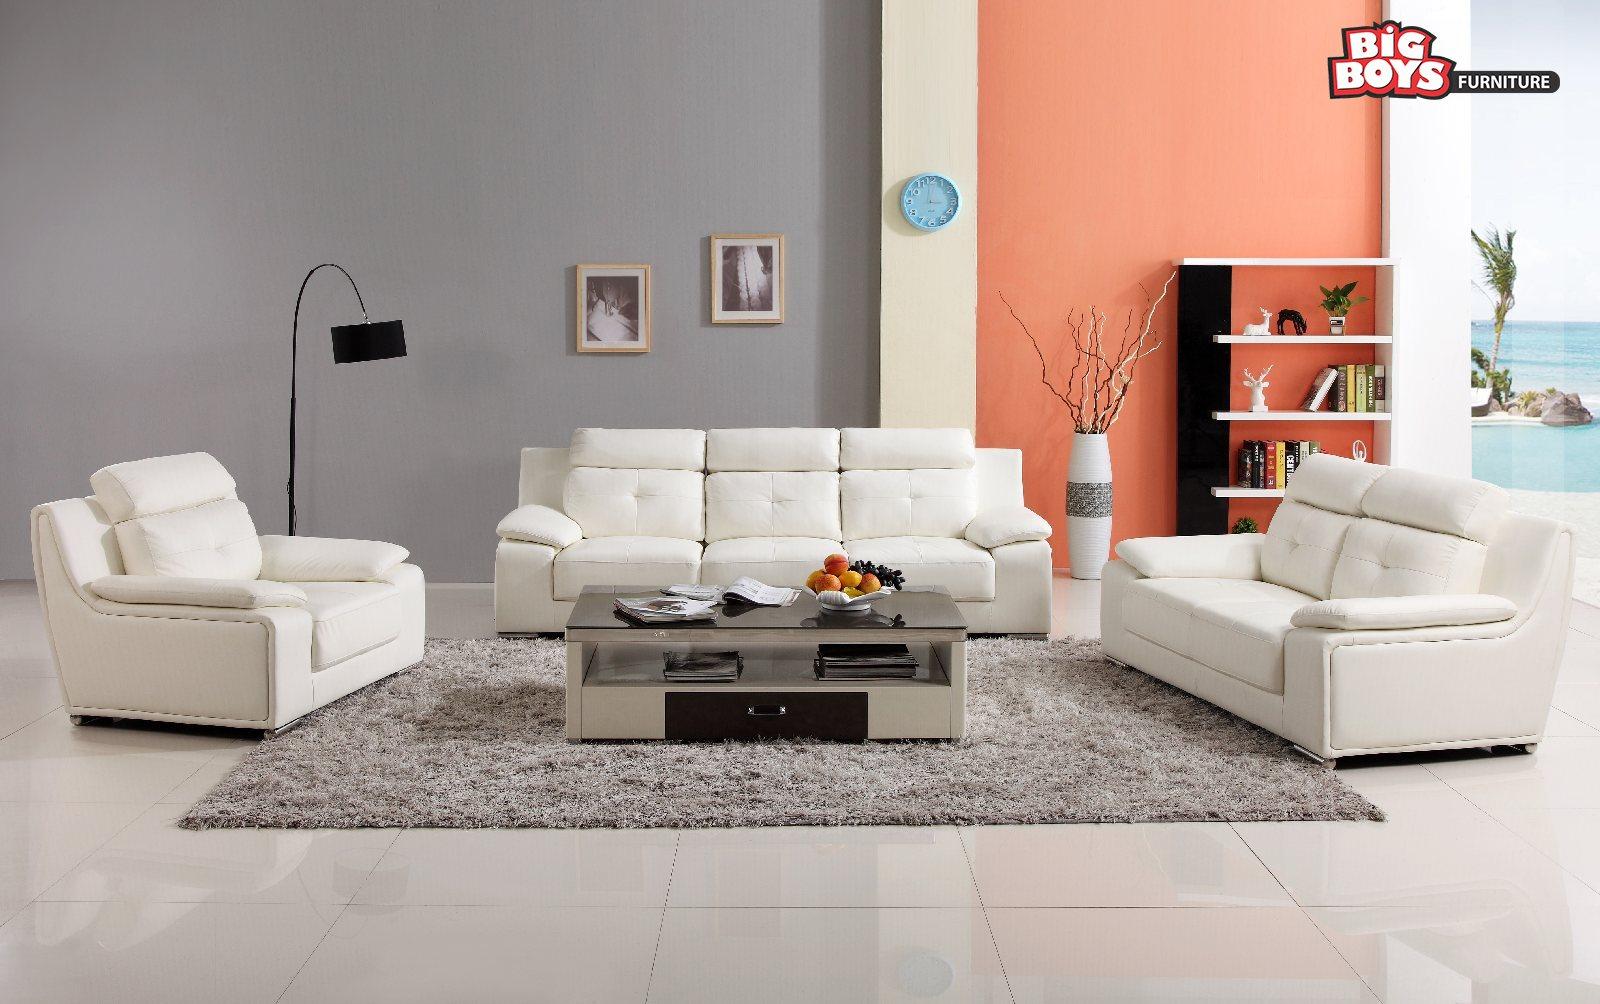 Big Boys Furniture is specialist in making designer sofas